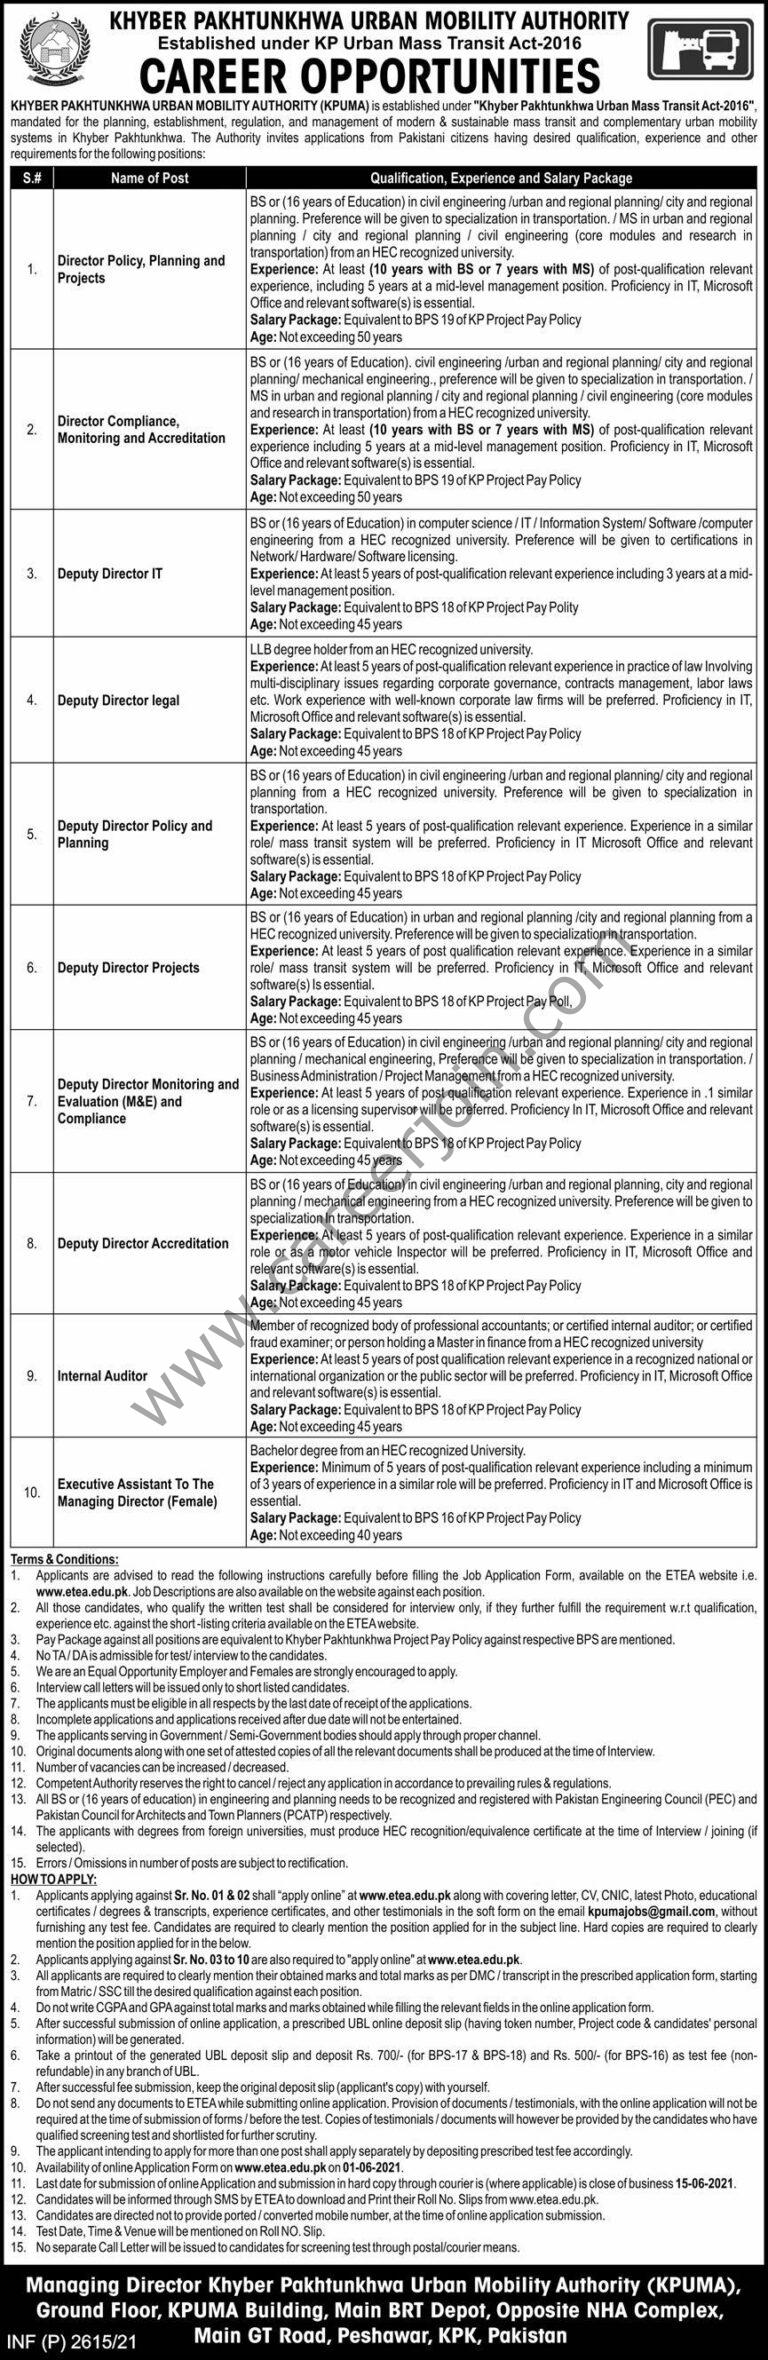 Khyber Pakhtunkhwa Urban Mobility Authority KPUMA Jobs 2021 in Pakistan